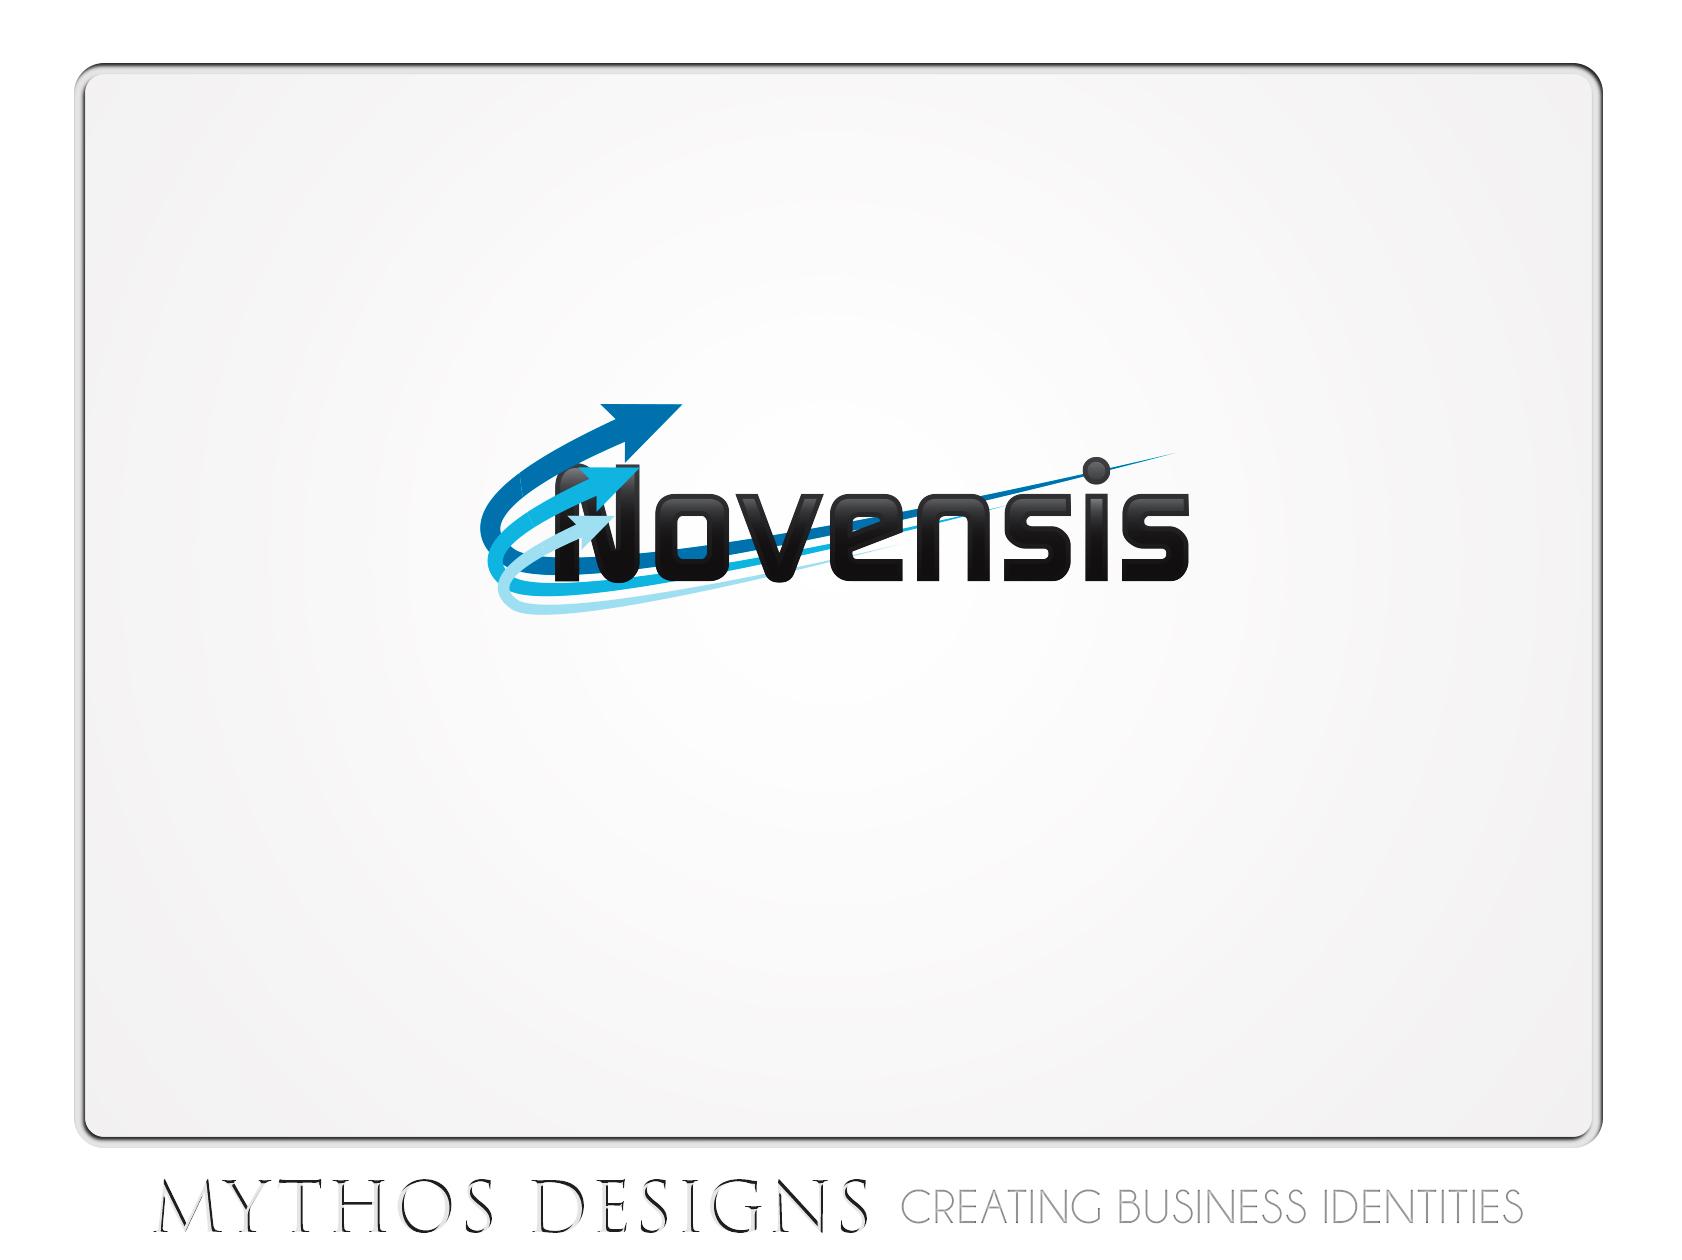 Logo Design by Mythos Designs - Entry No. 44 in the Logo Design Contest Novensis Logo Design.